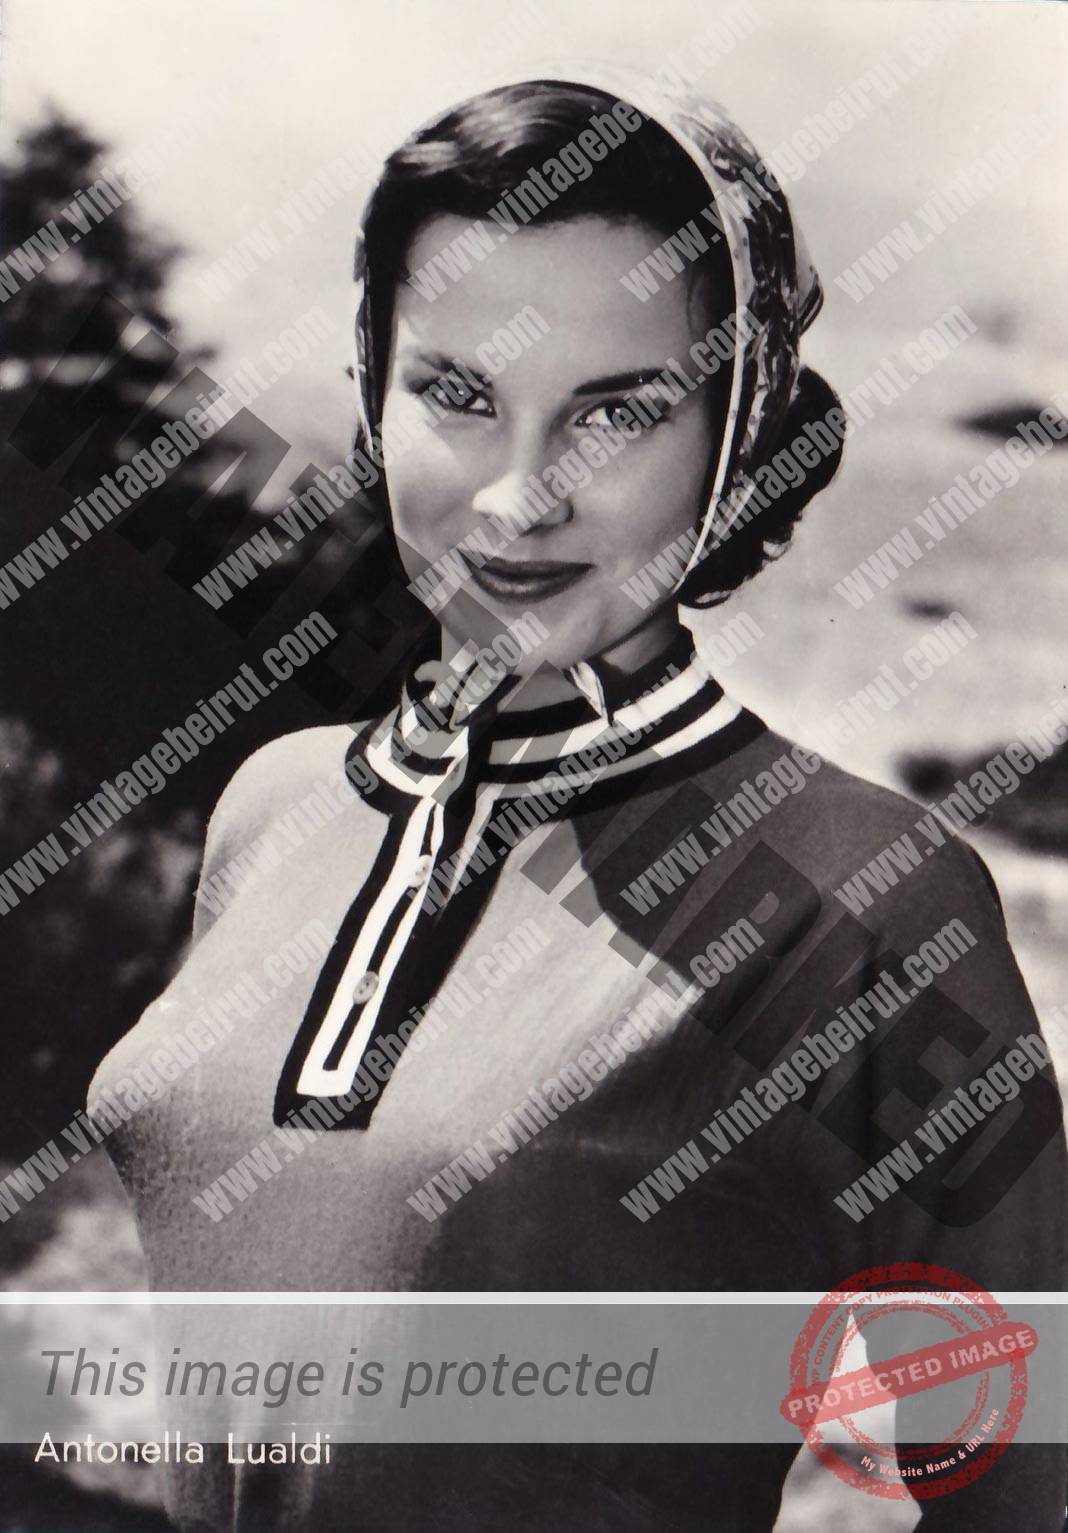 Communication on this topic: Kathleen McClellan, antonella-lualdi-born-1931-born-in-beirut/